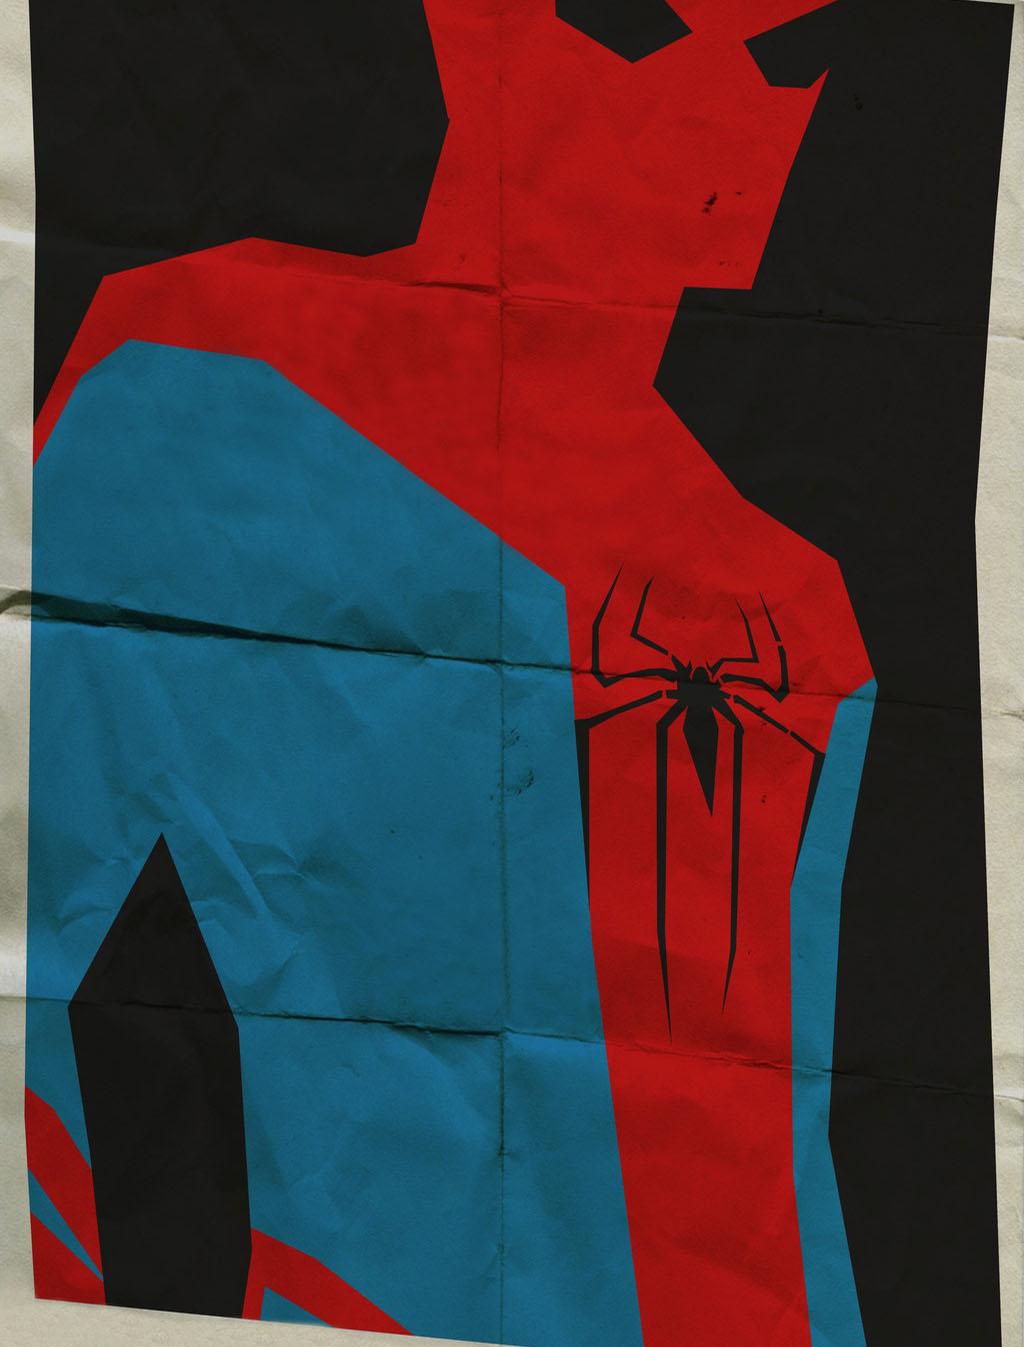 Wallpaper T Shirt Merah Biru Bendera Pola Seni Desain